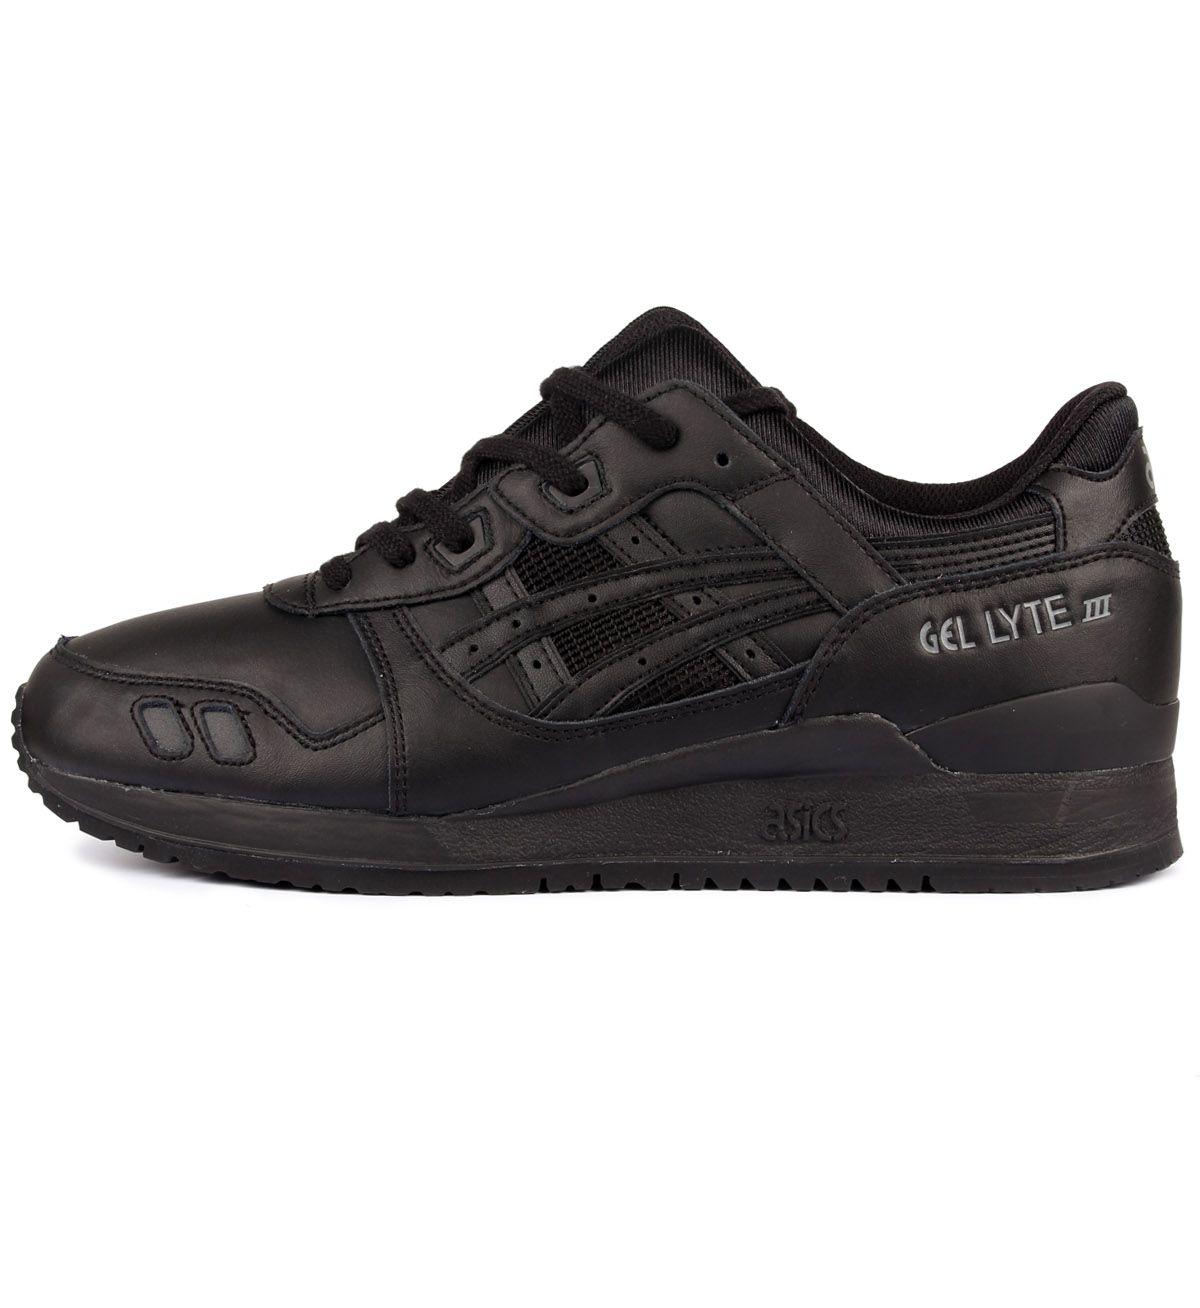 ASICS Gel Lyte III Black / Black